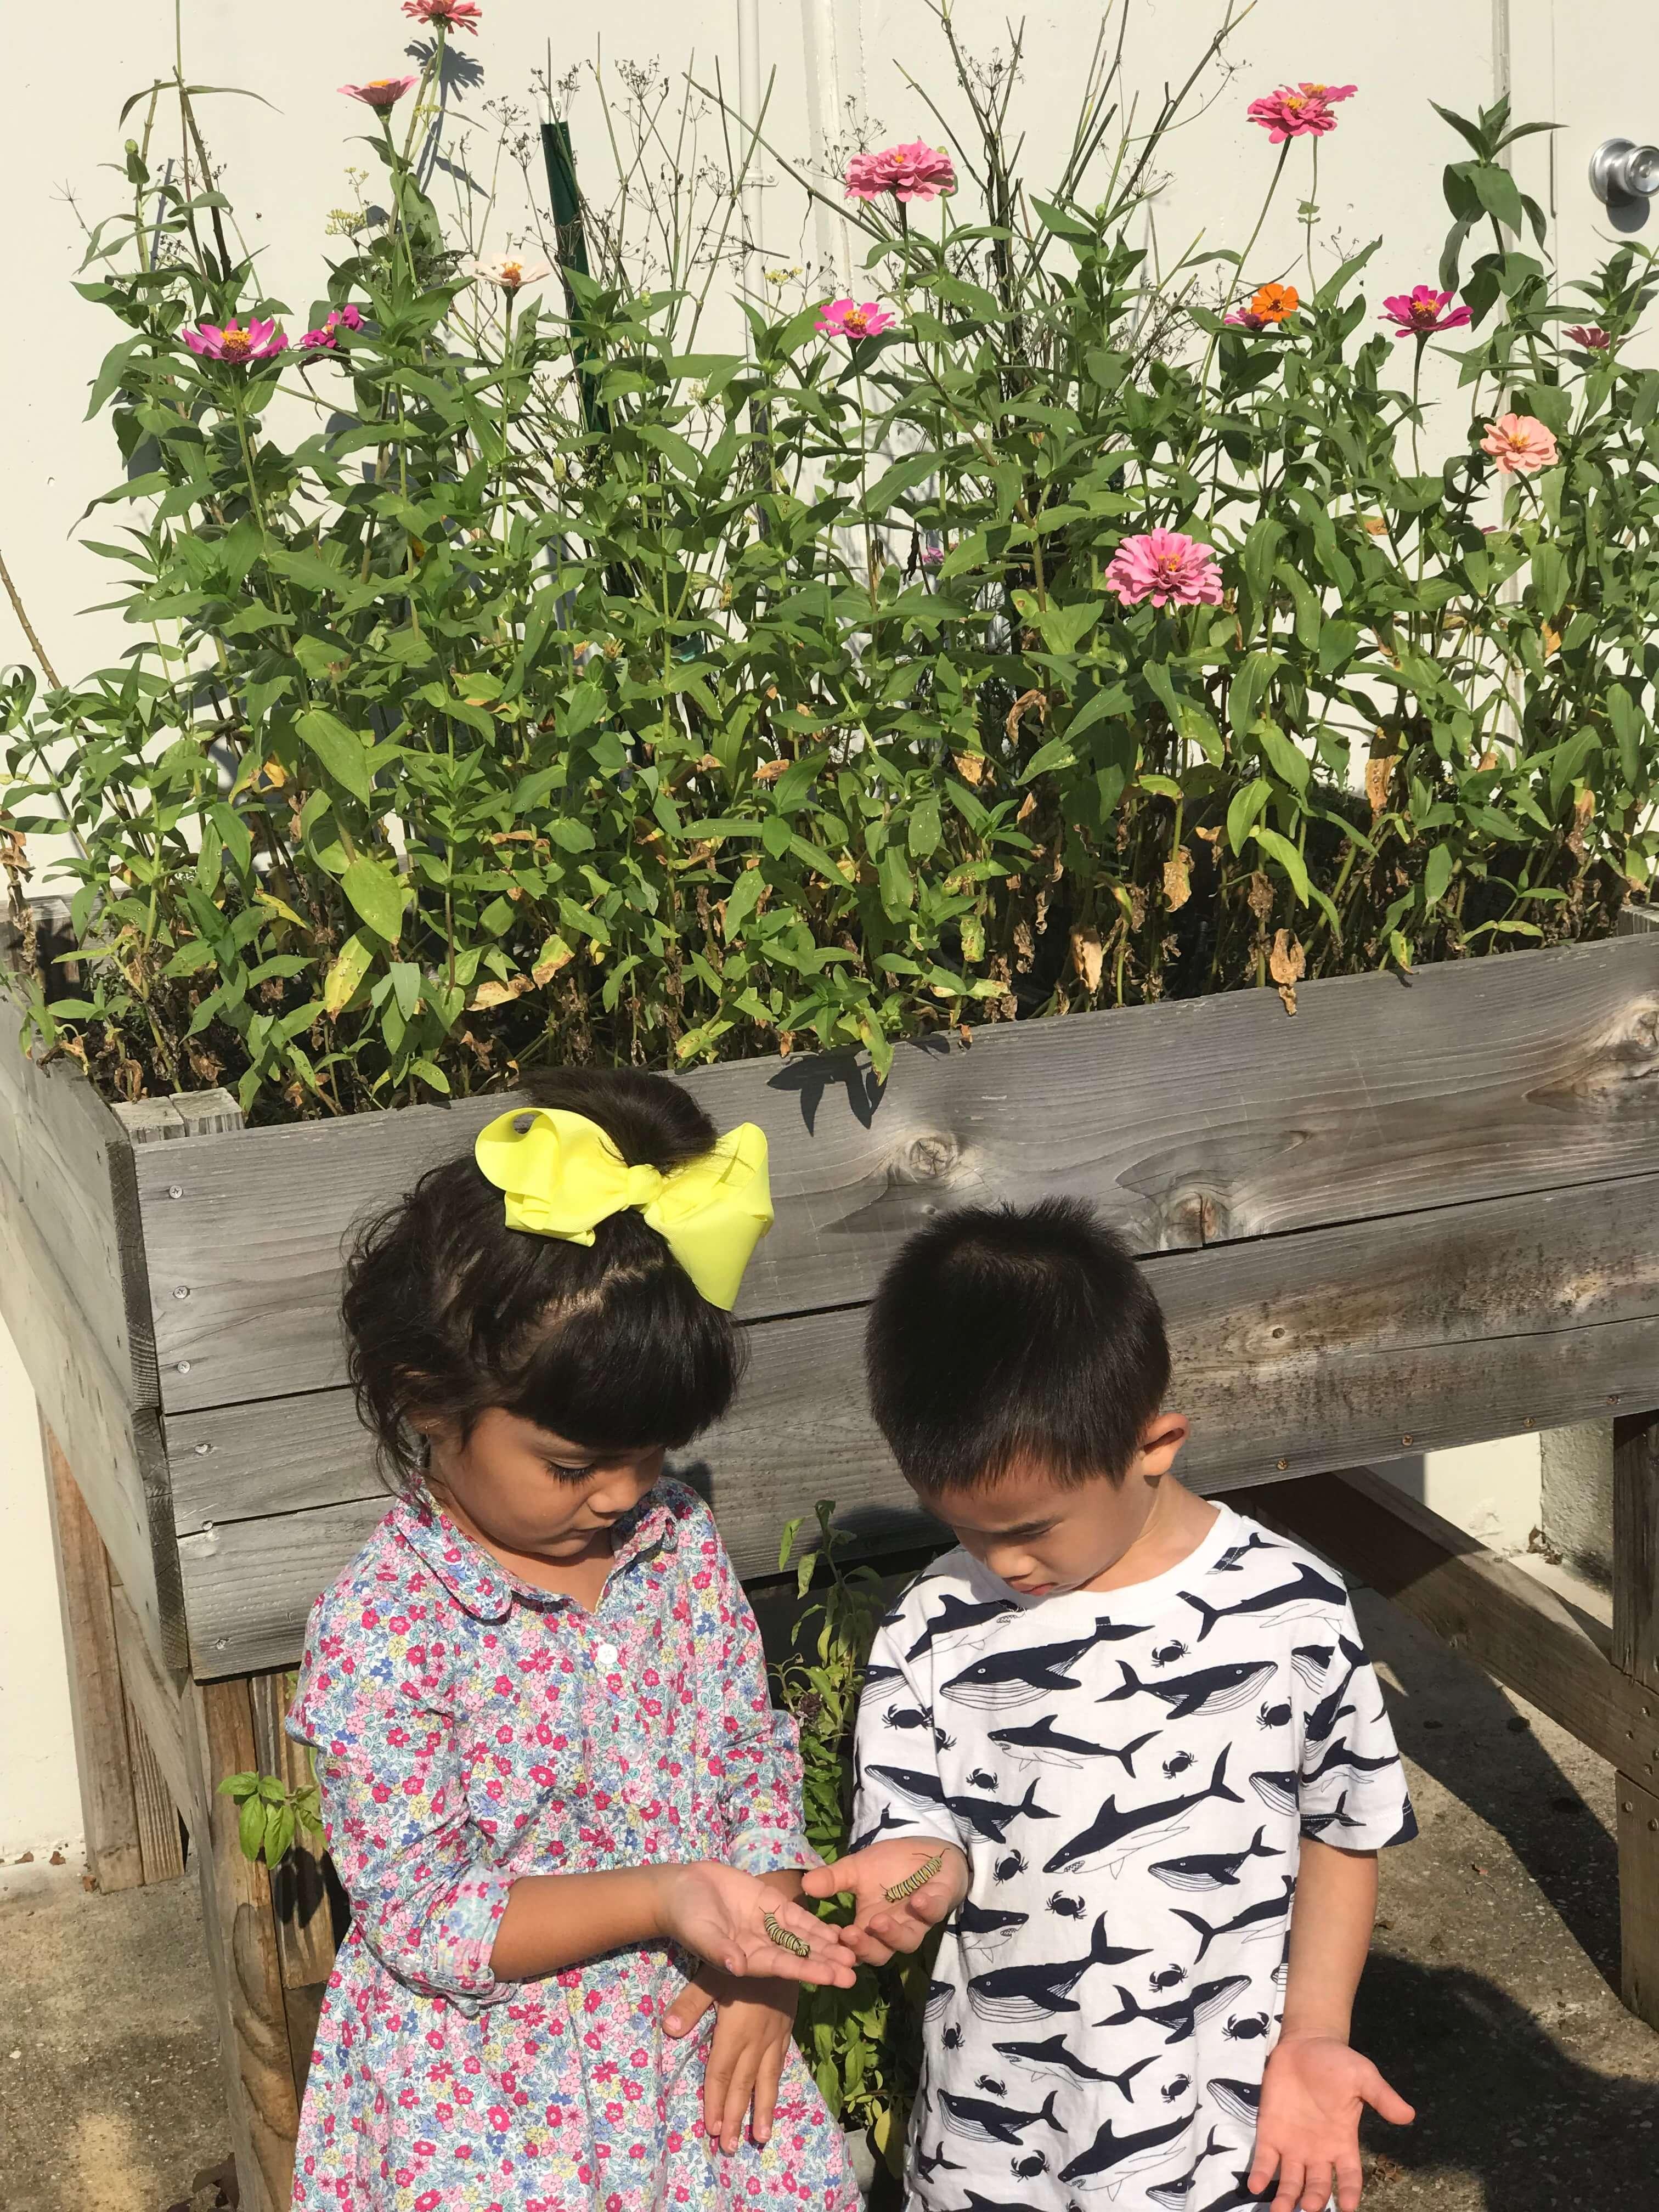 Two kids holding caterpillars